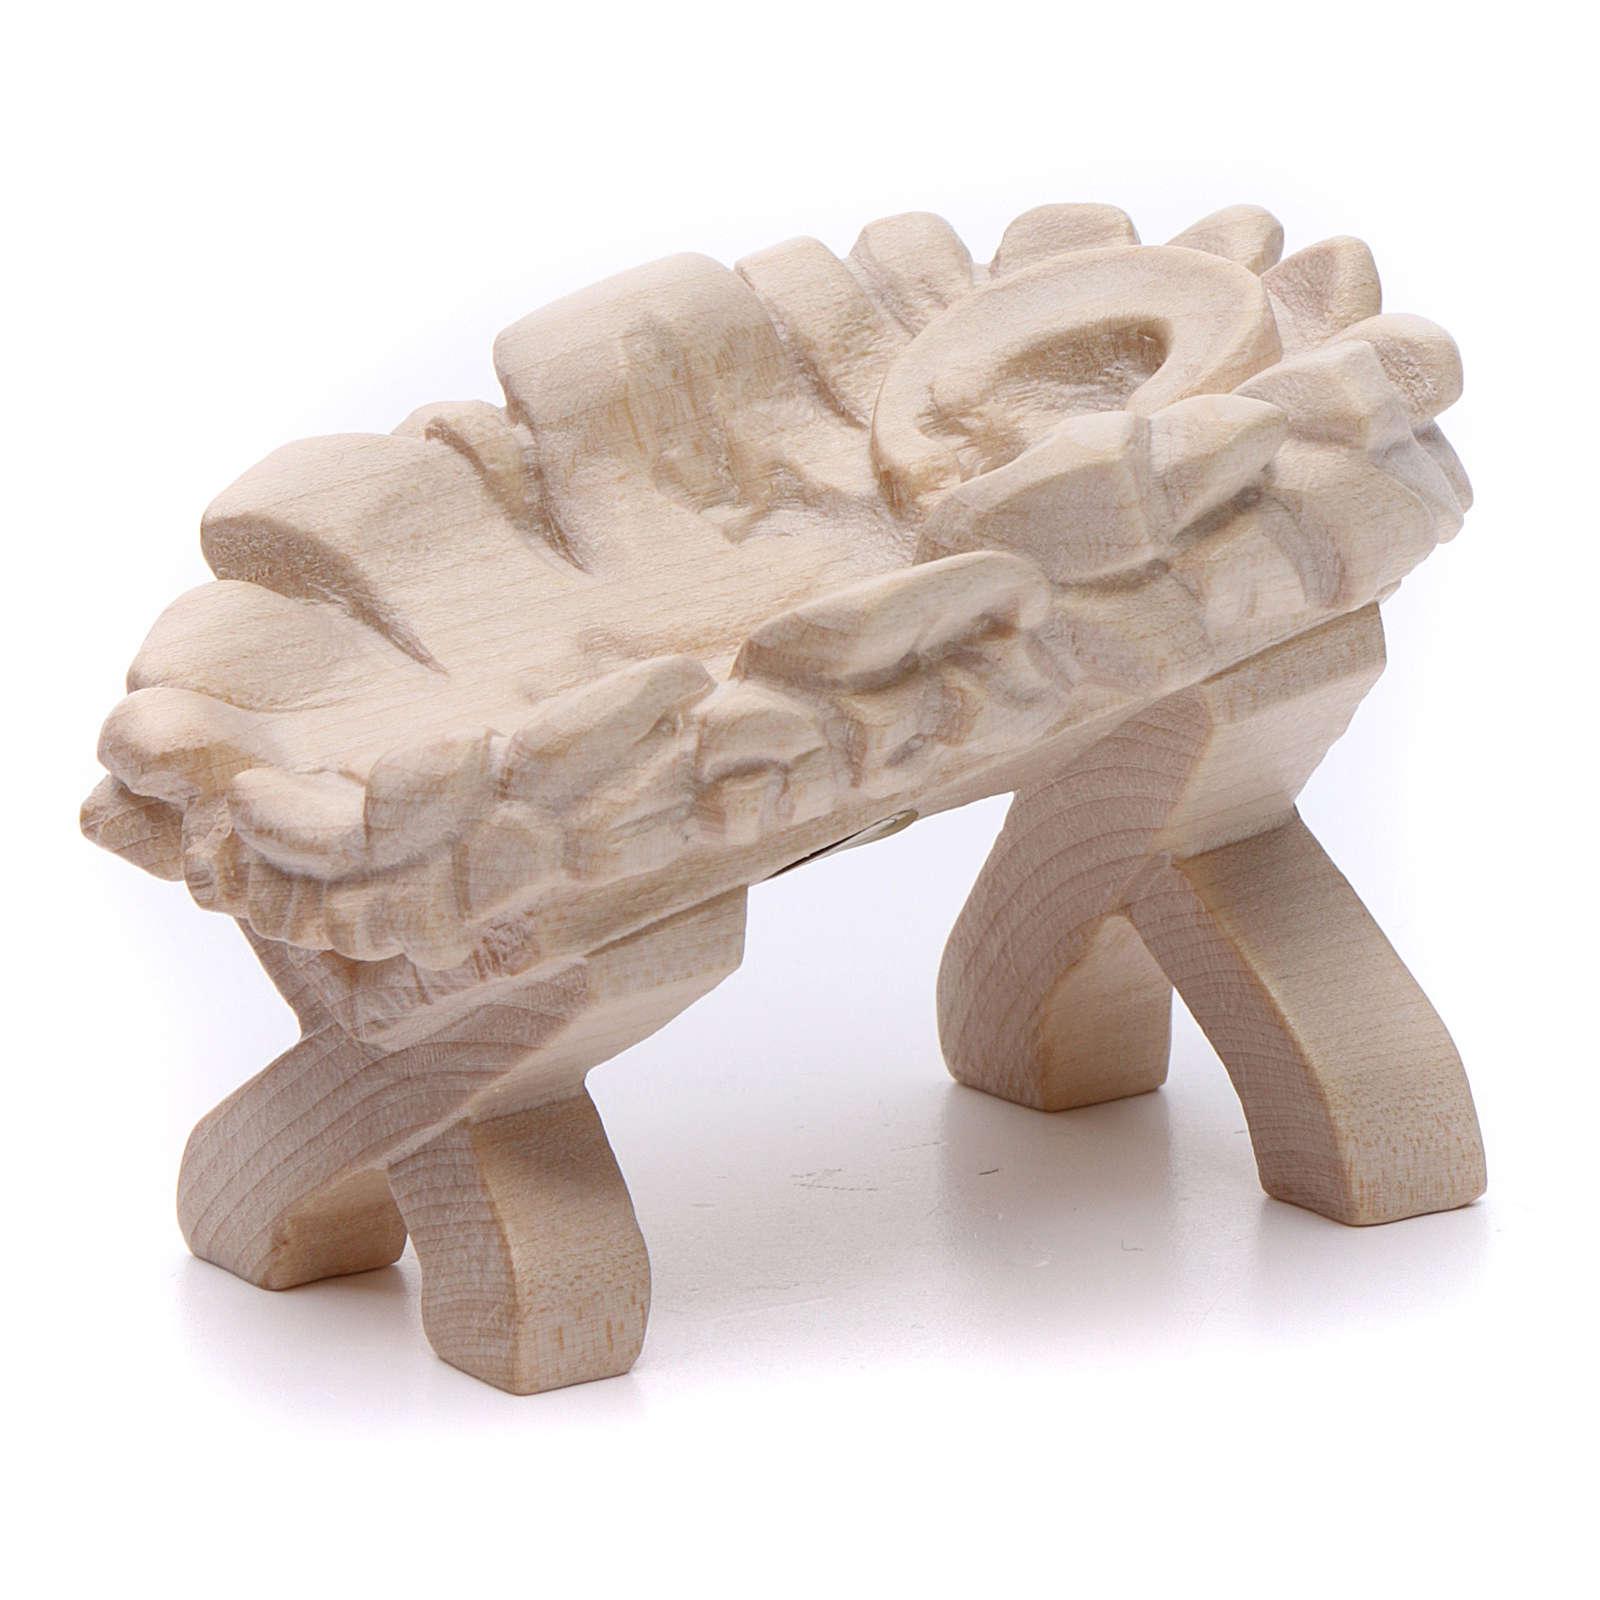 Baby Jesus cradle, 7cm in Valgardena wood, natural wax finish 3